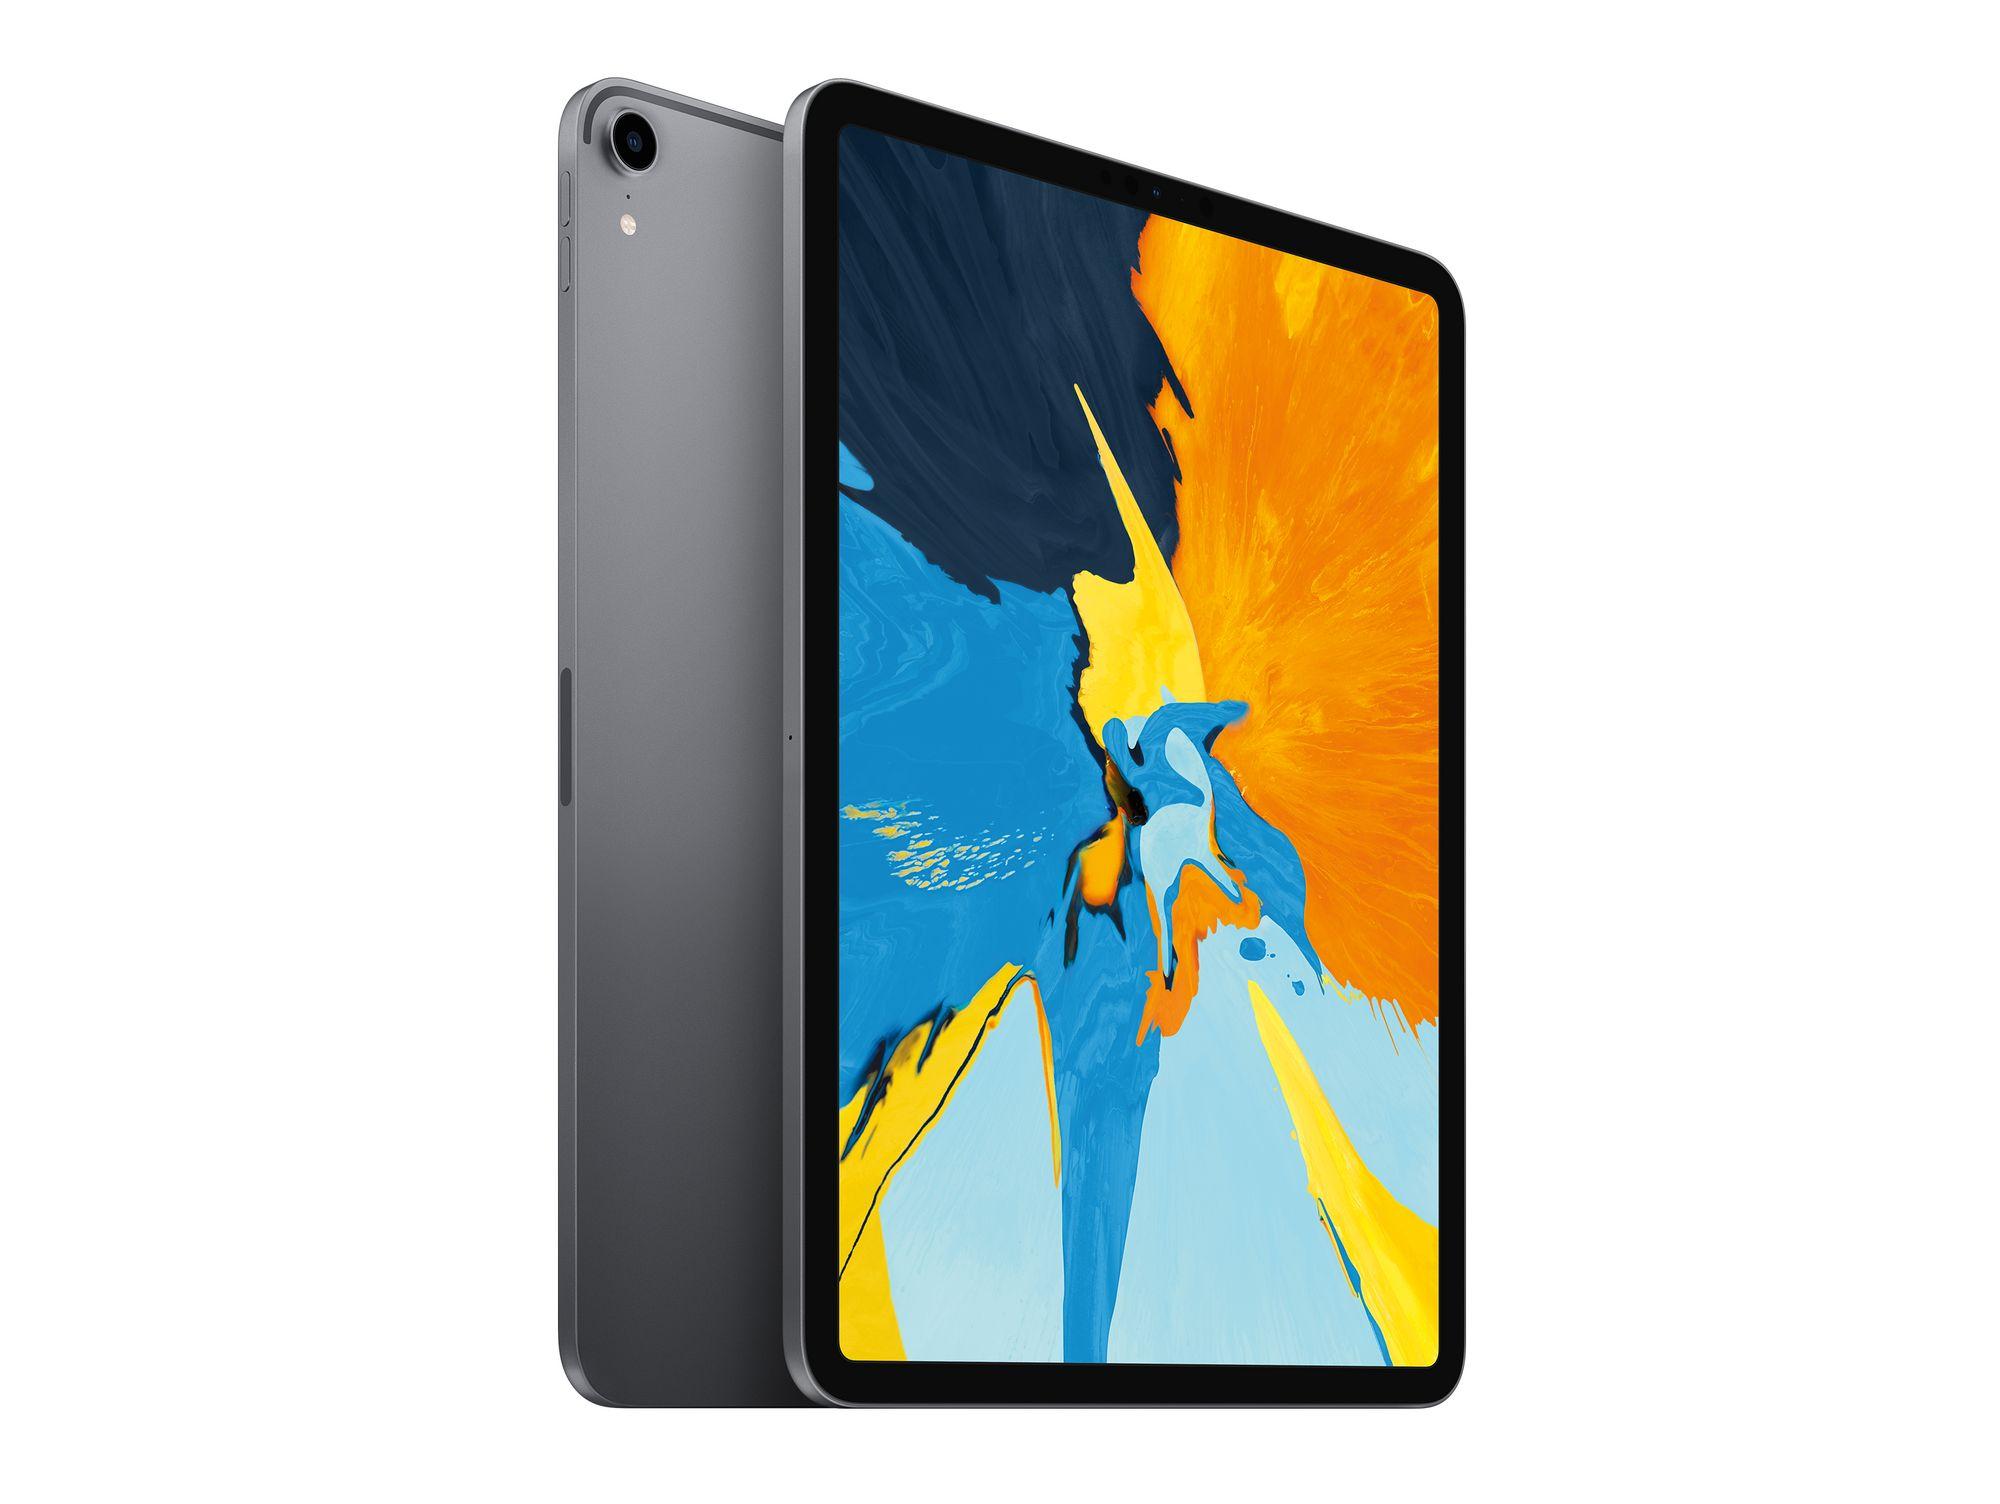 "[gravis] Apple iPad Pro 11"" 64GB Wi-Fi, Space Gray 2018 (MTXN2FD/A / MTXN2KN/A)"